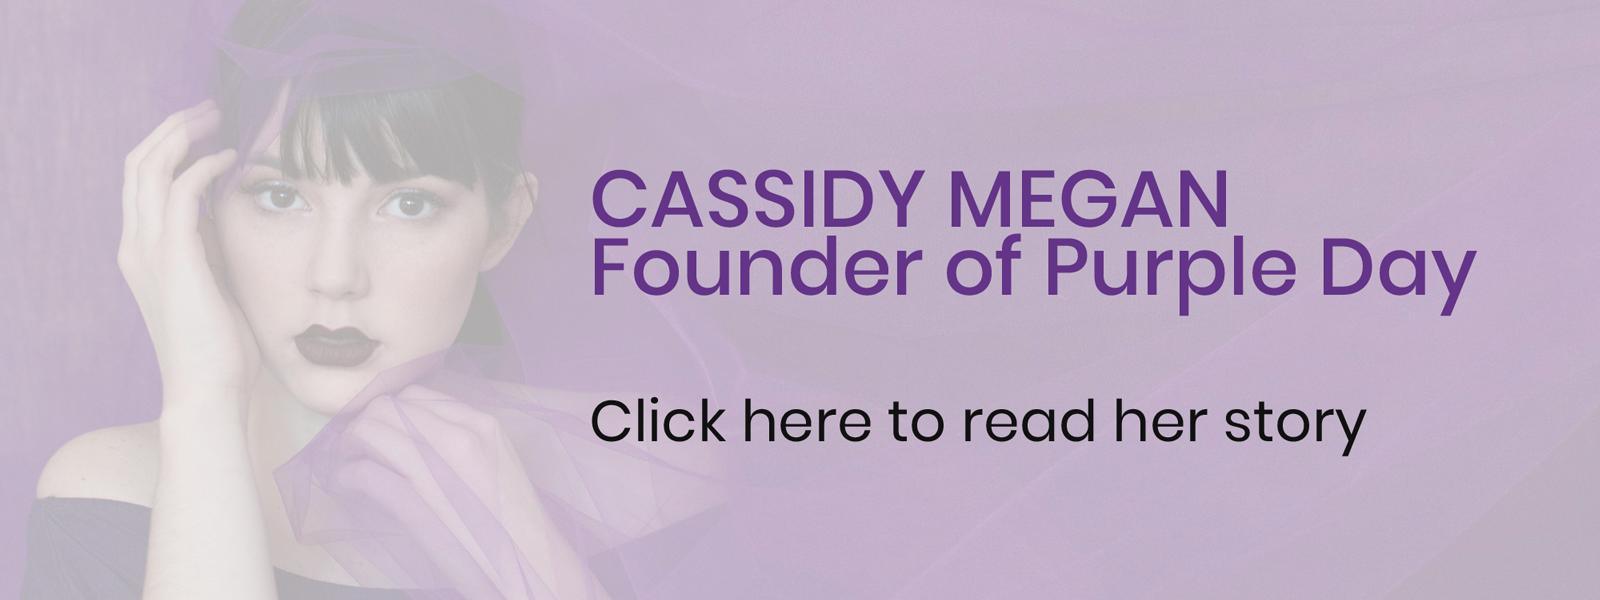 read cassidy megan story